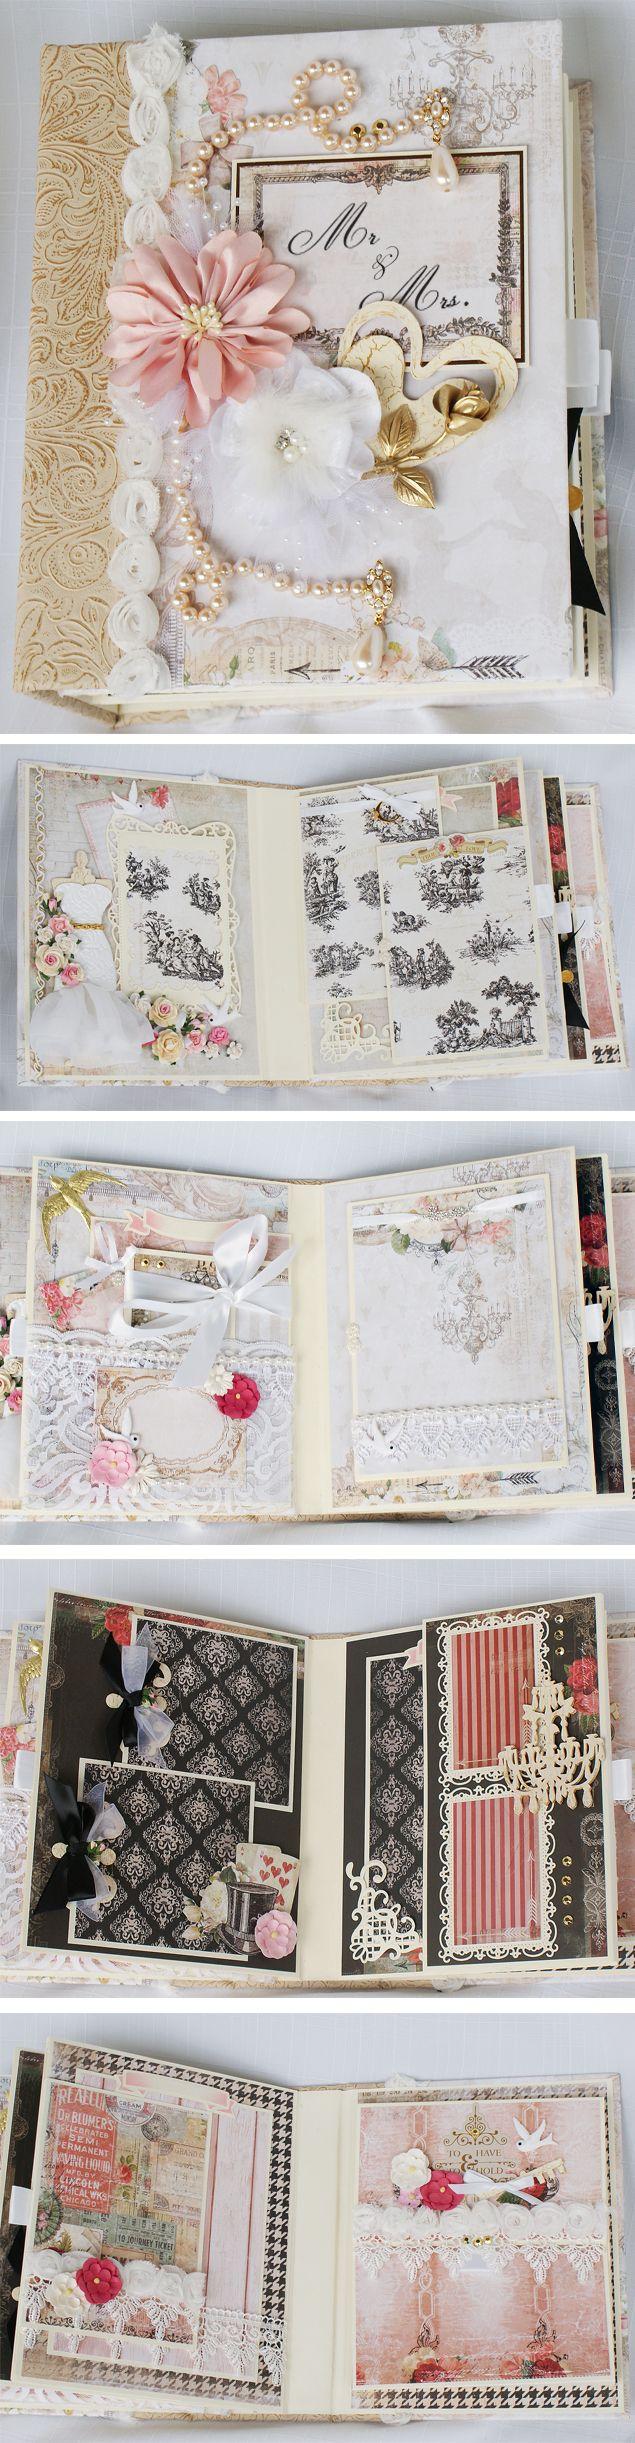 Wedding album  Custom Designed Scrapbook Album by Terry's Scrapbooks  https://www.facebook.com/TerrysScrapbooks